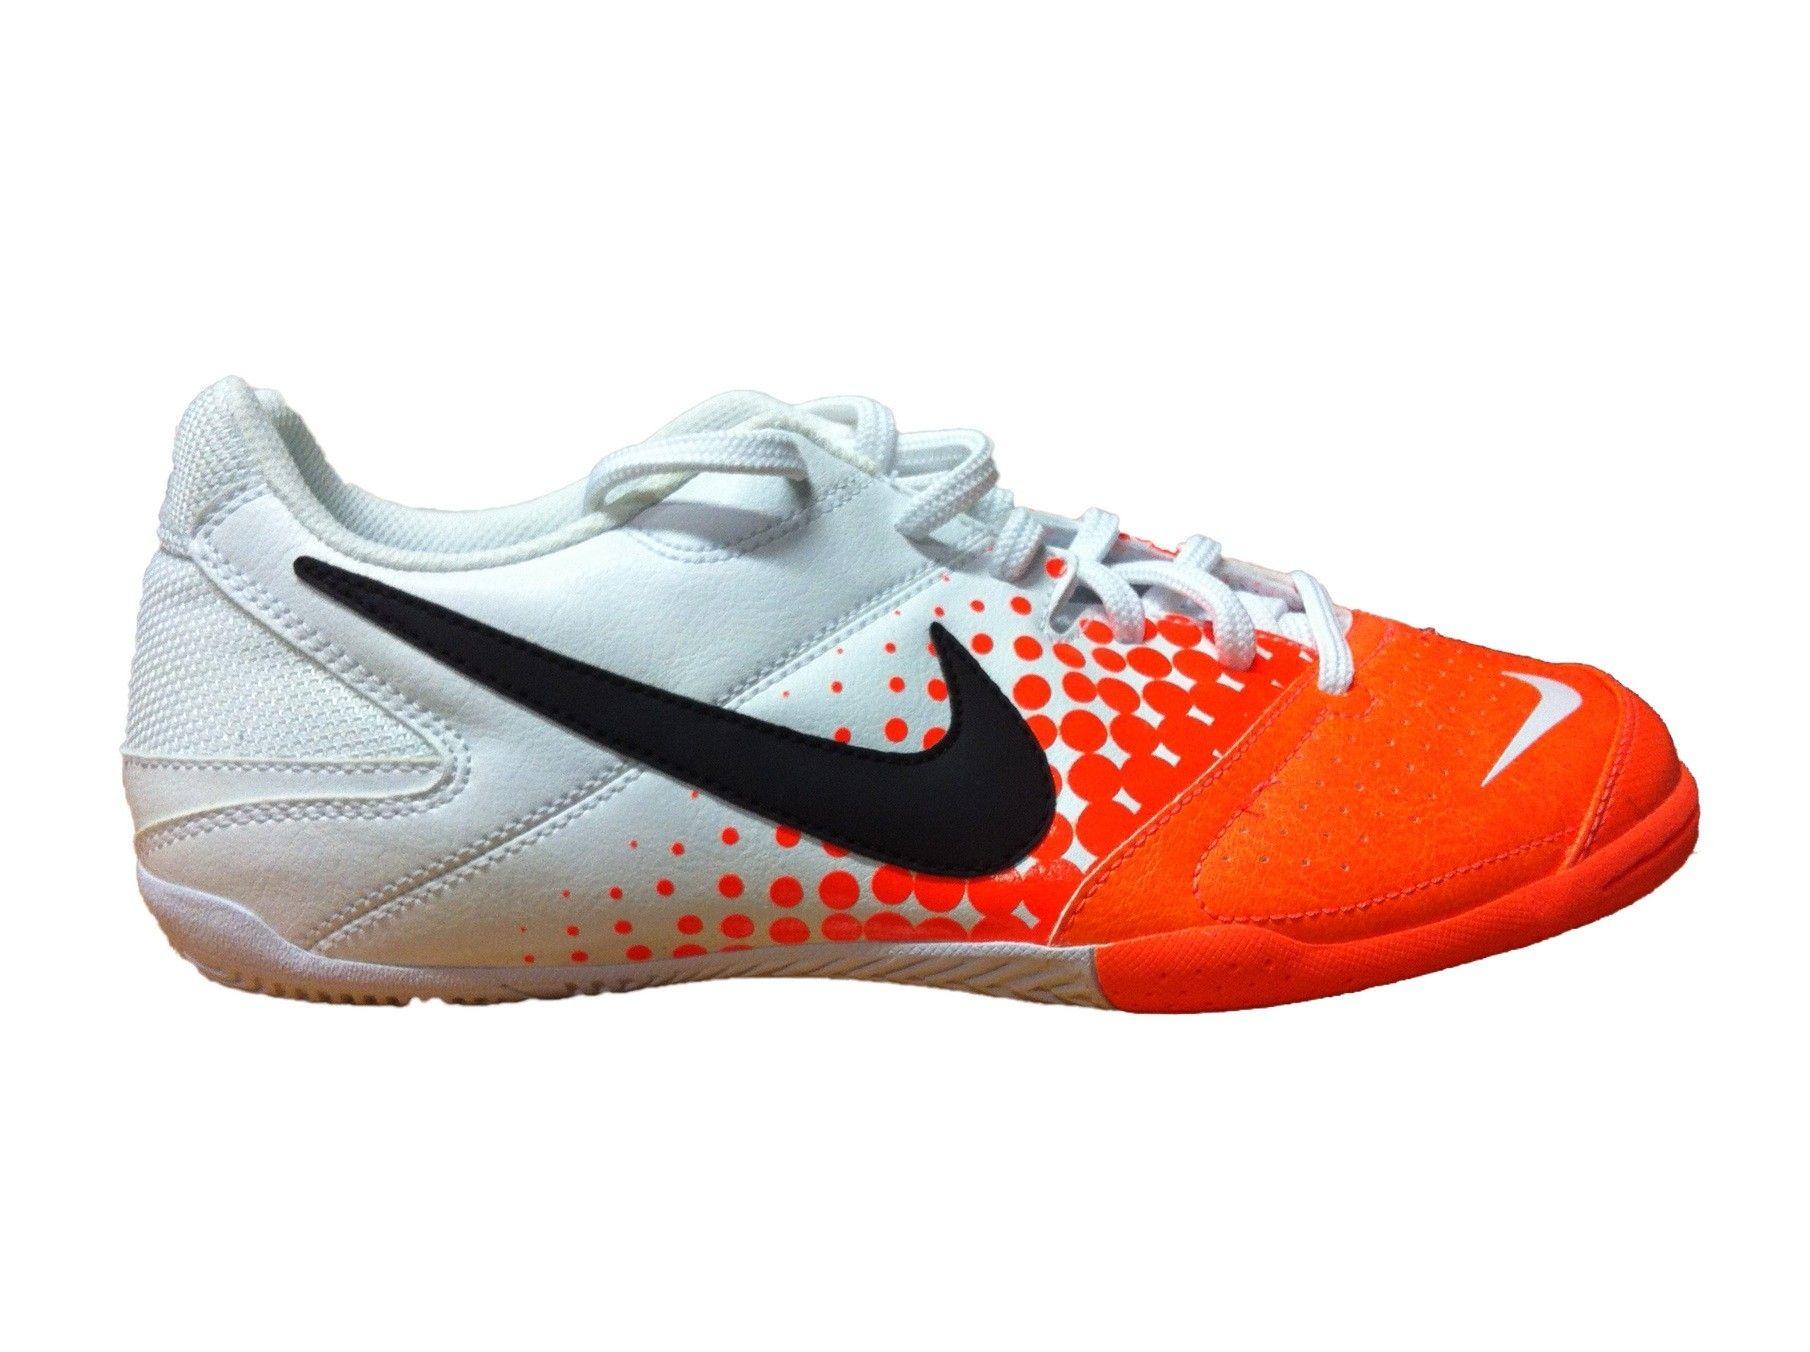 finest selection f00c2 a8d8b NIKE 5 ELASTICO (Blanca-Naranja) - Fútbol Sala - Calzado - Hombres